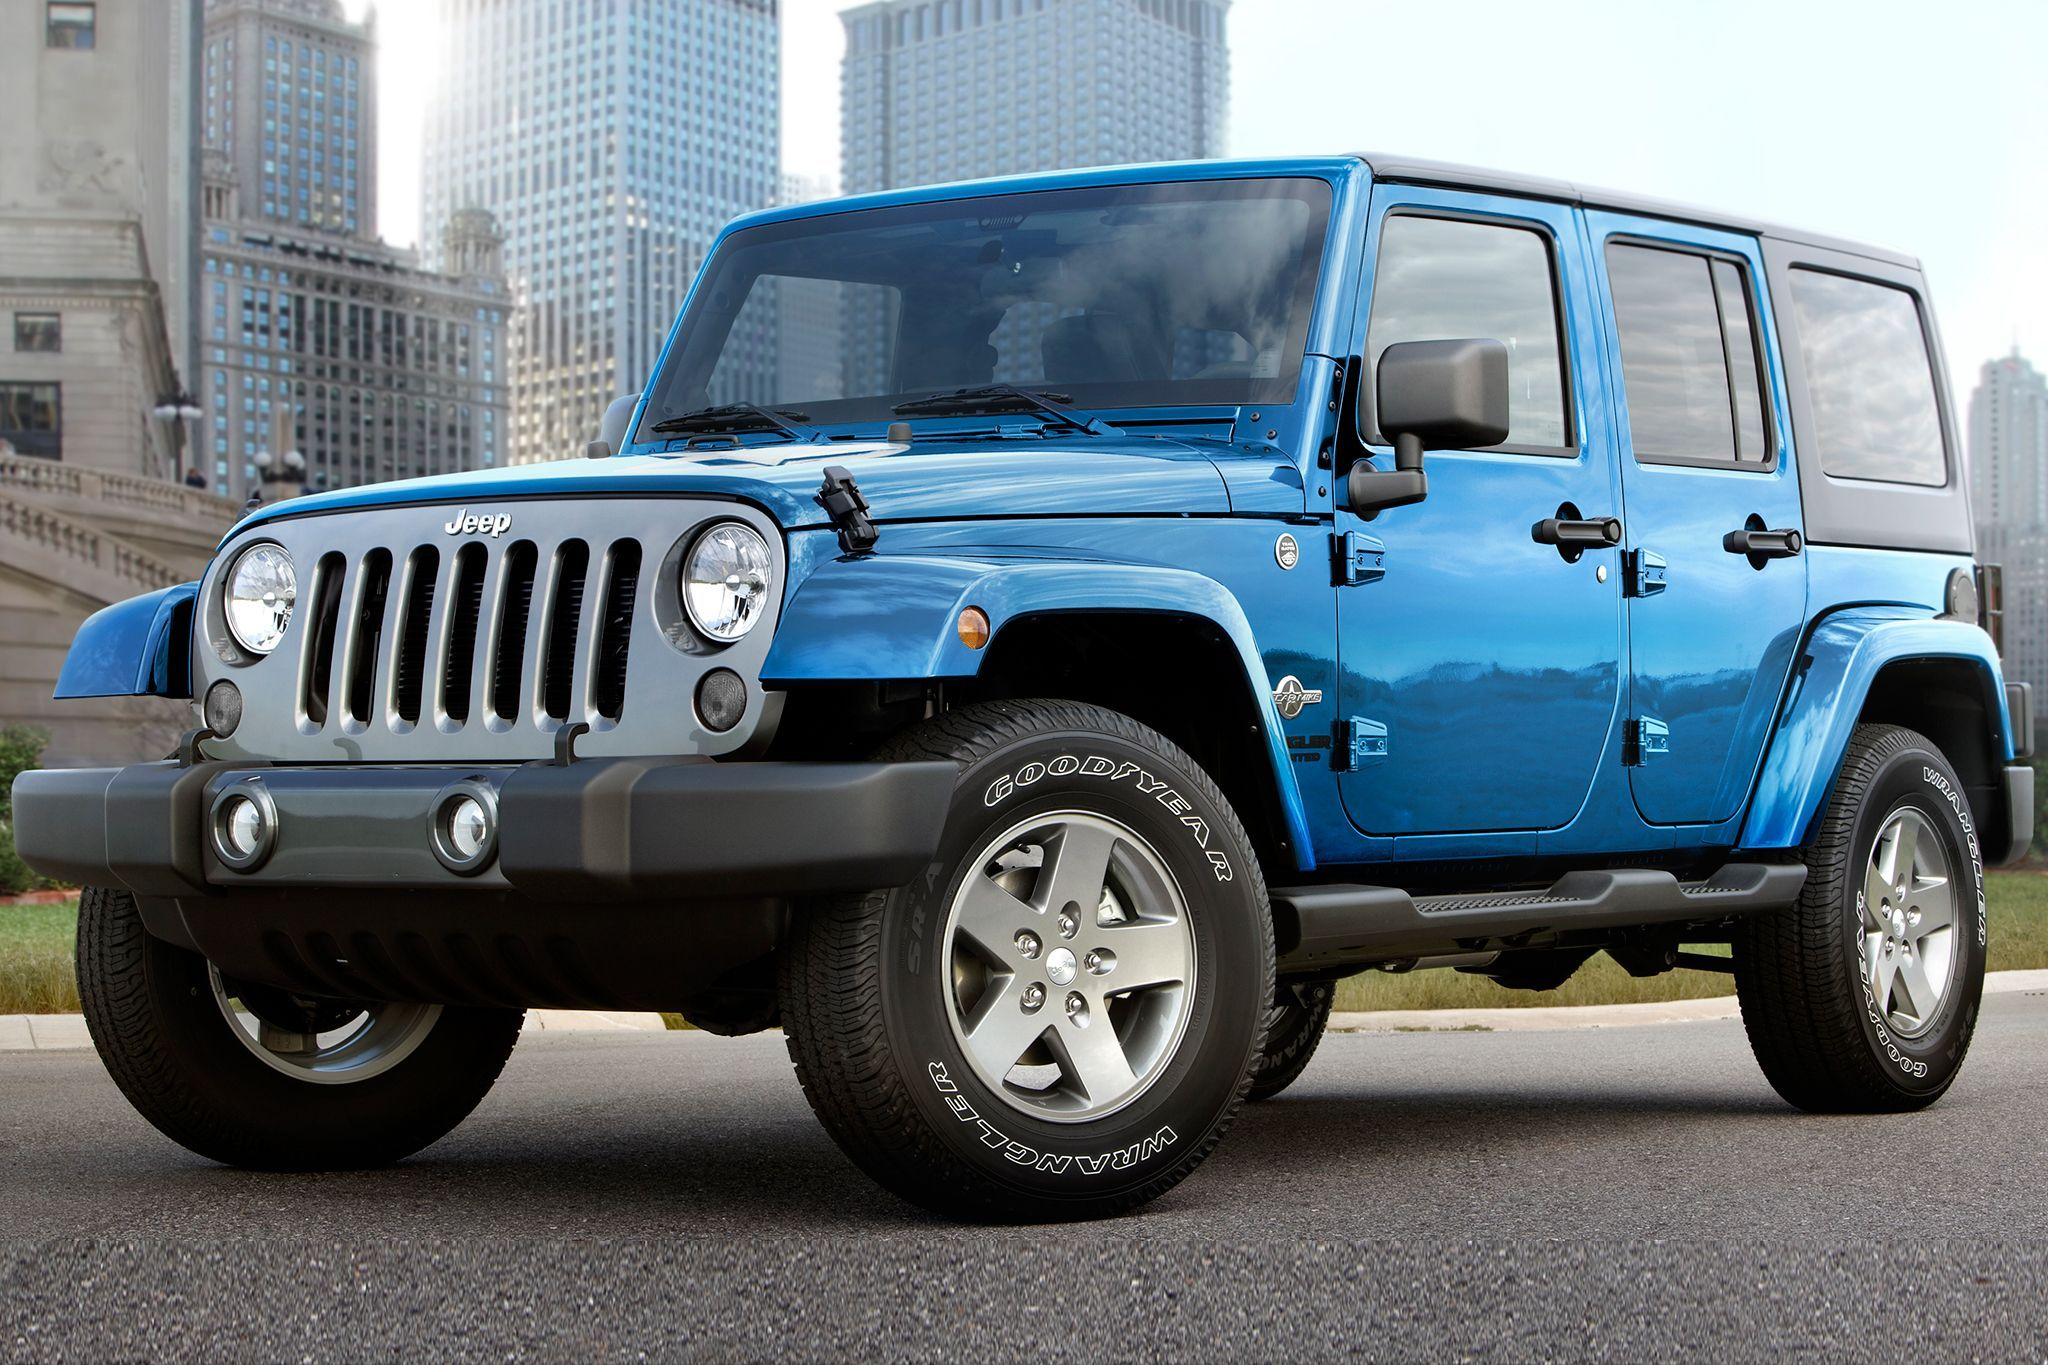 2017 Jeep Wrangler Will Keep Solid Axle Suspension 2015 Jeep Wrangler Unlimited Sport Jeep Wrangler 2015 Jeep Wrangler Sahara